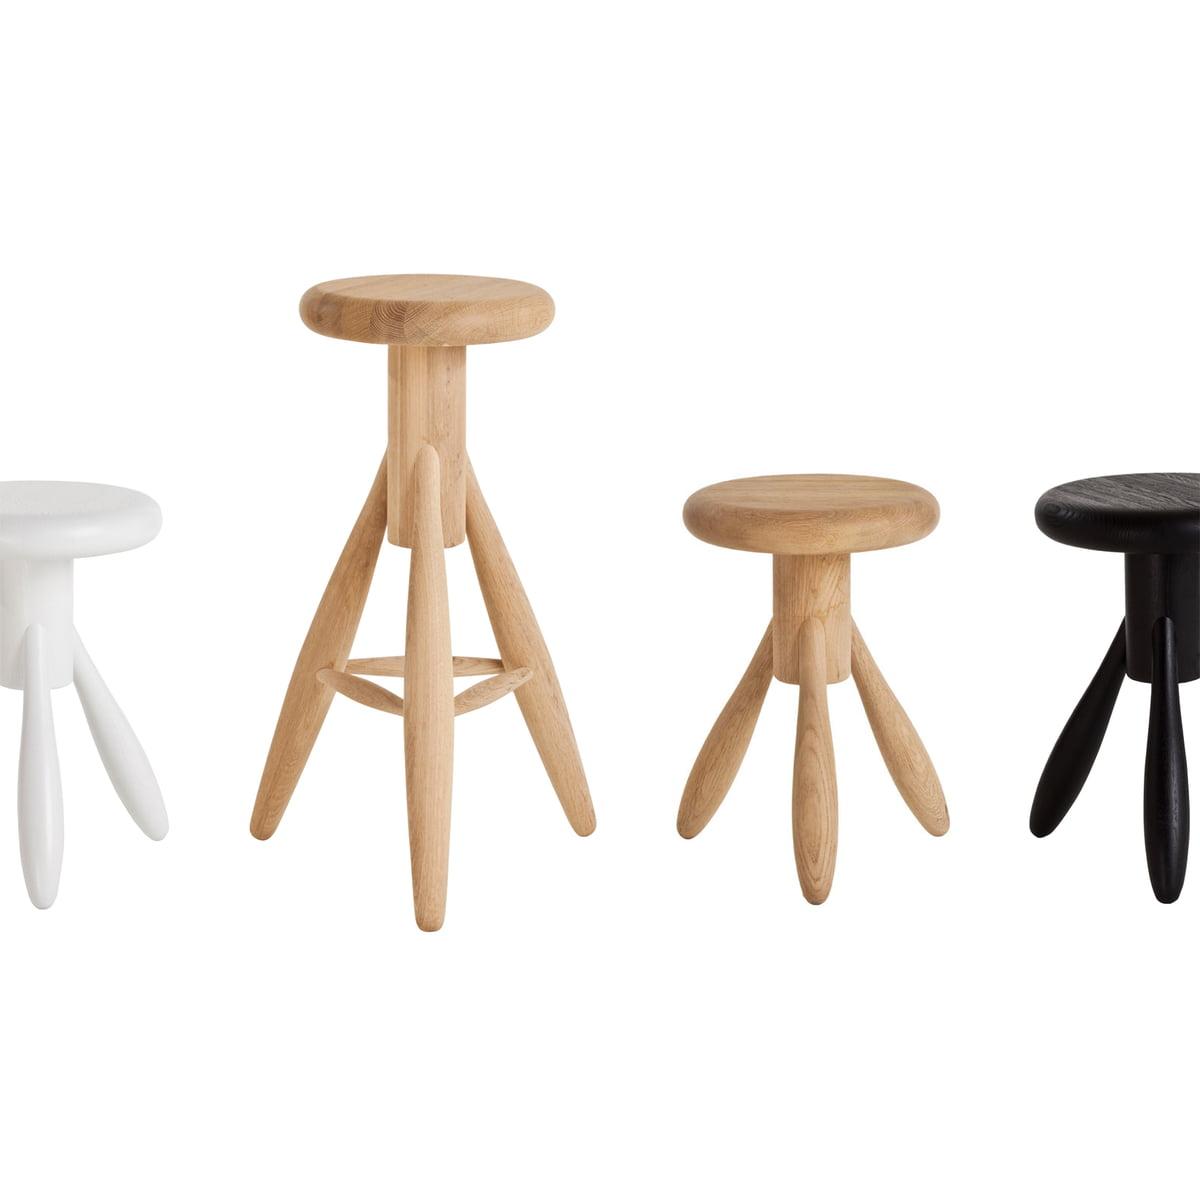 baby rocket stool  artek  shop - artek  rocket stool group